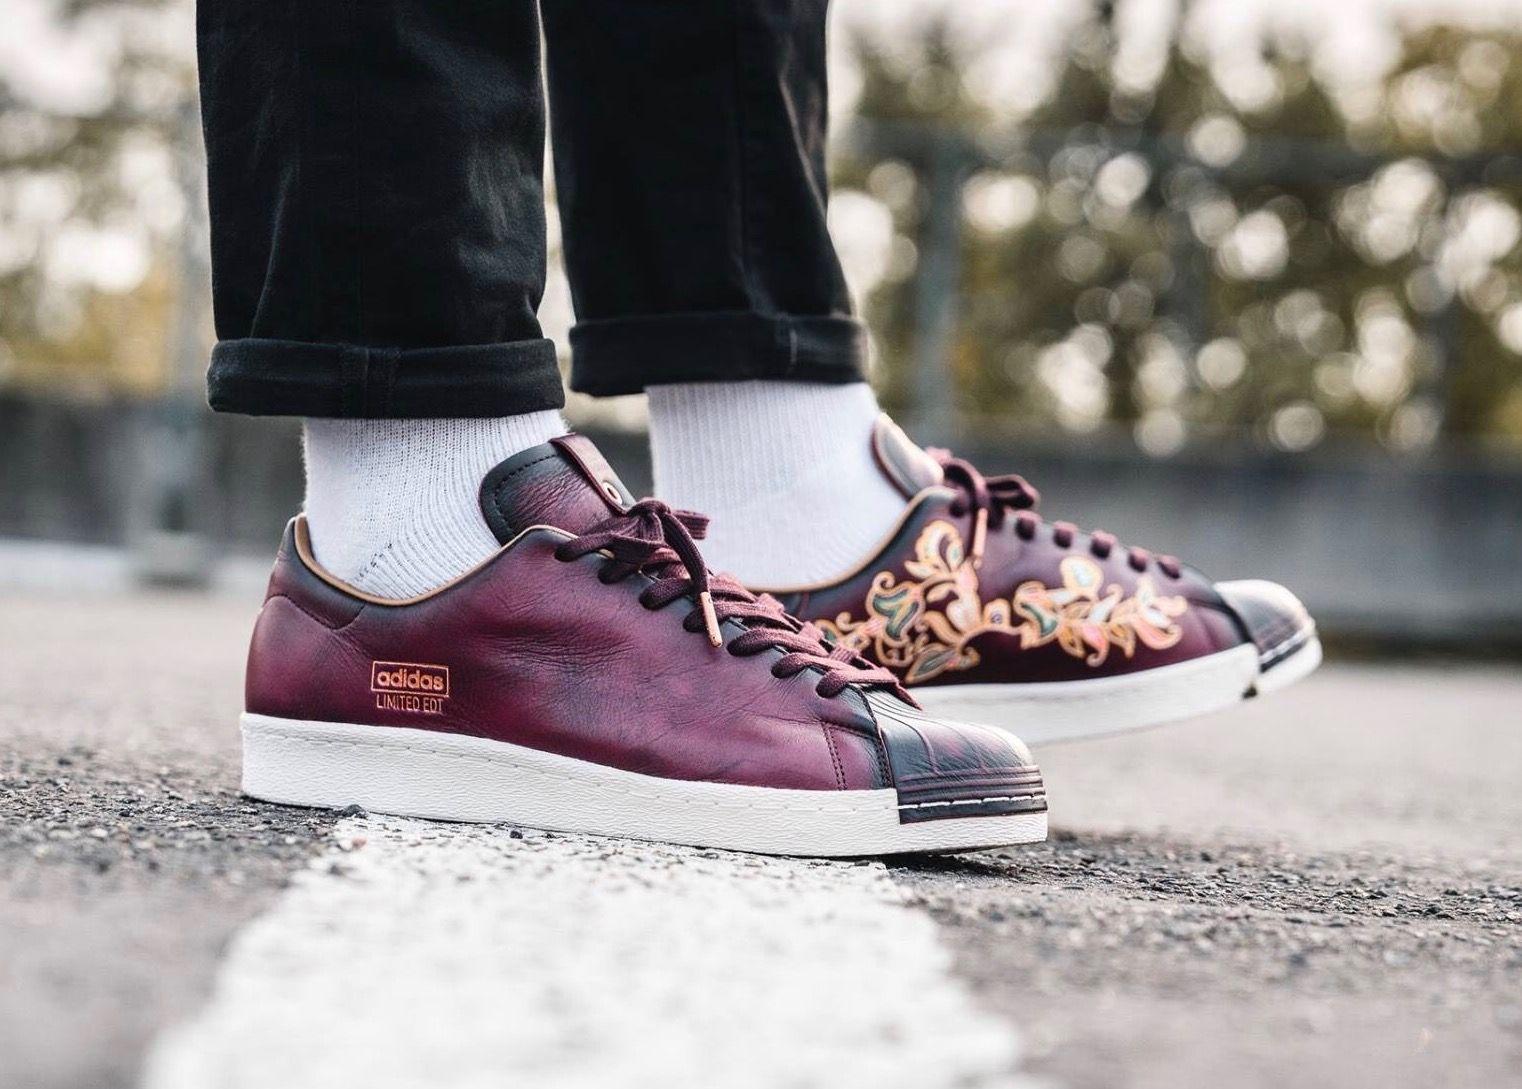 Moda Superstar Adidas Masculina Edition X Consortium Limited wxp47qAw